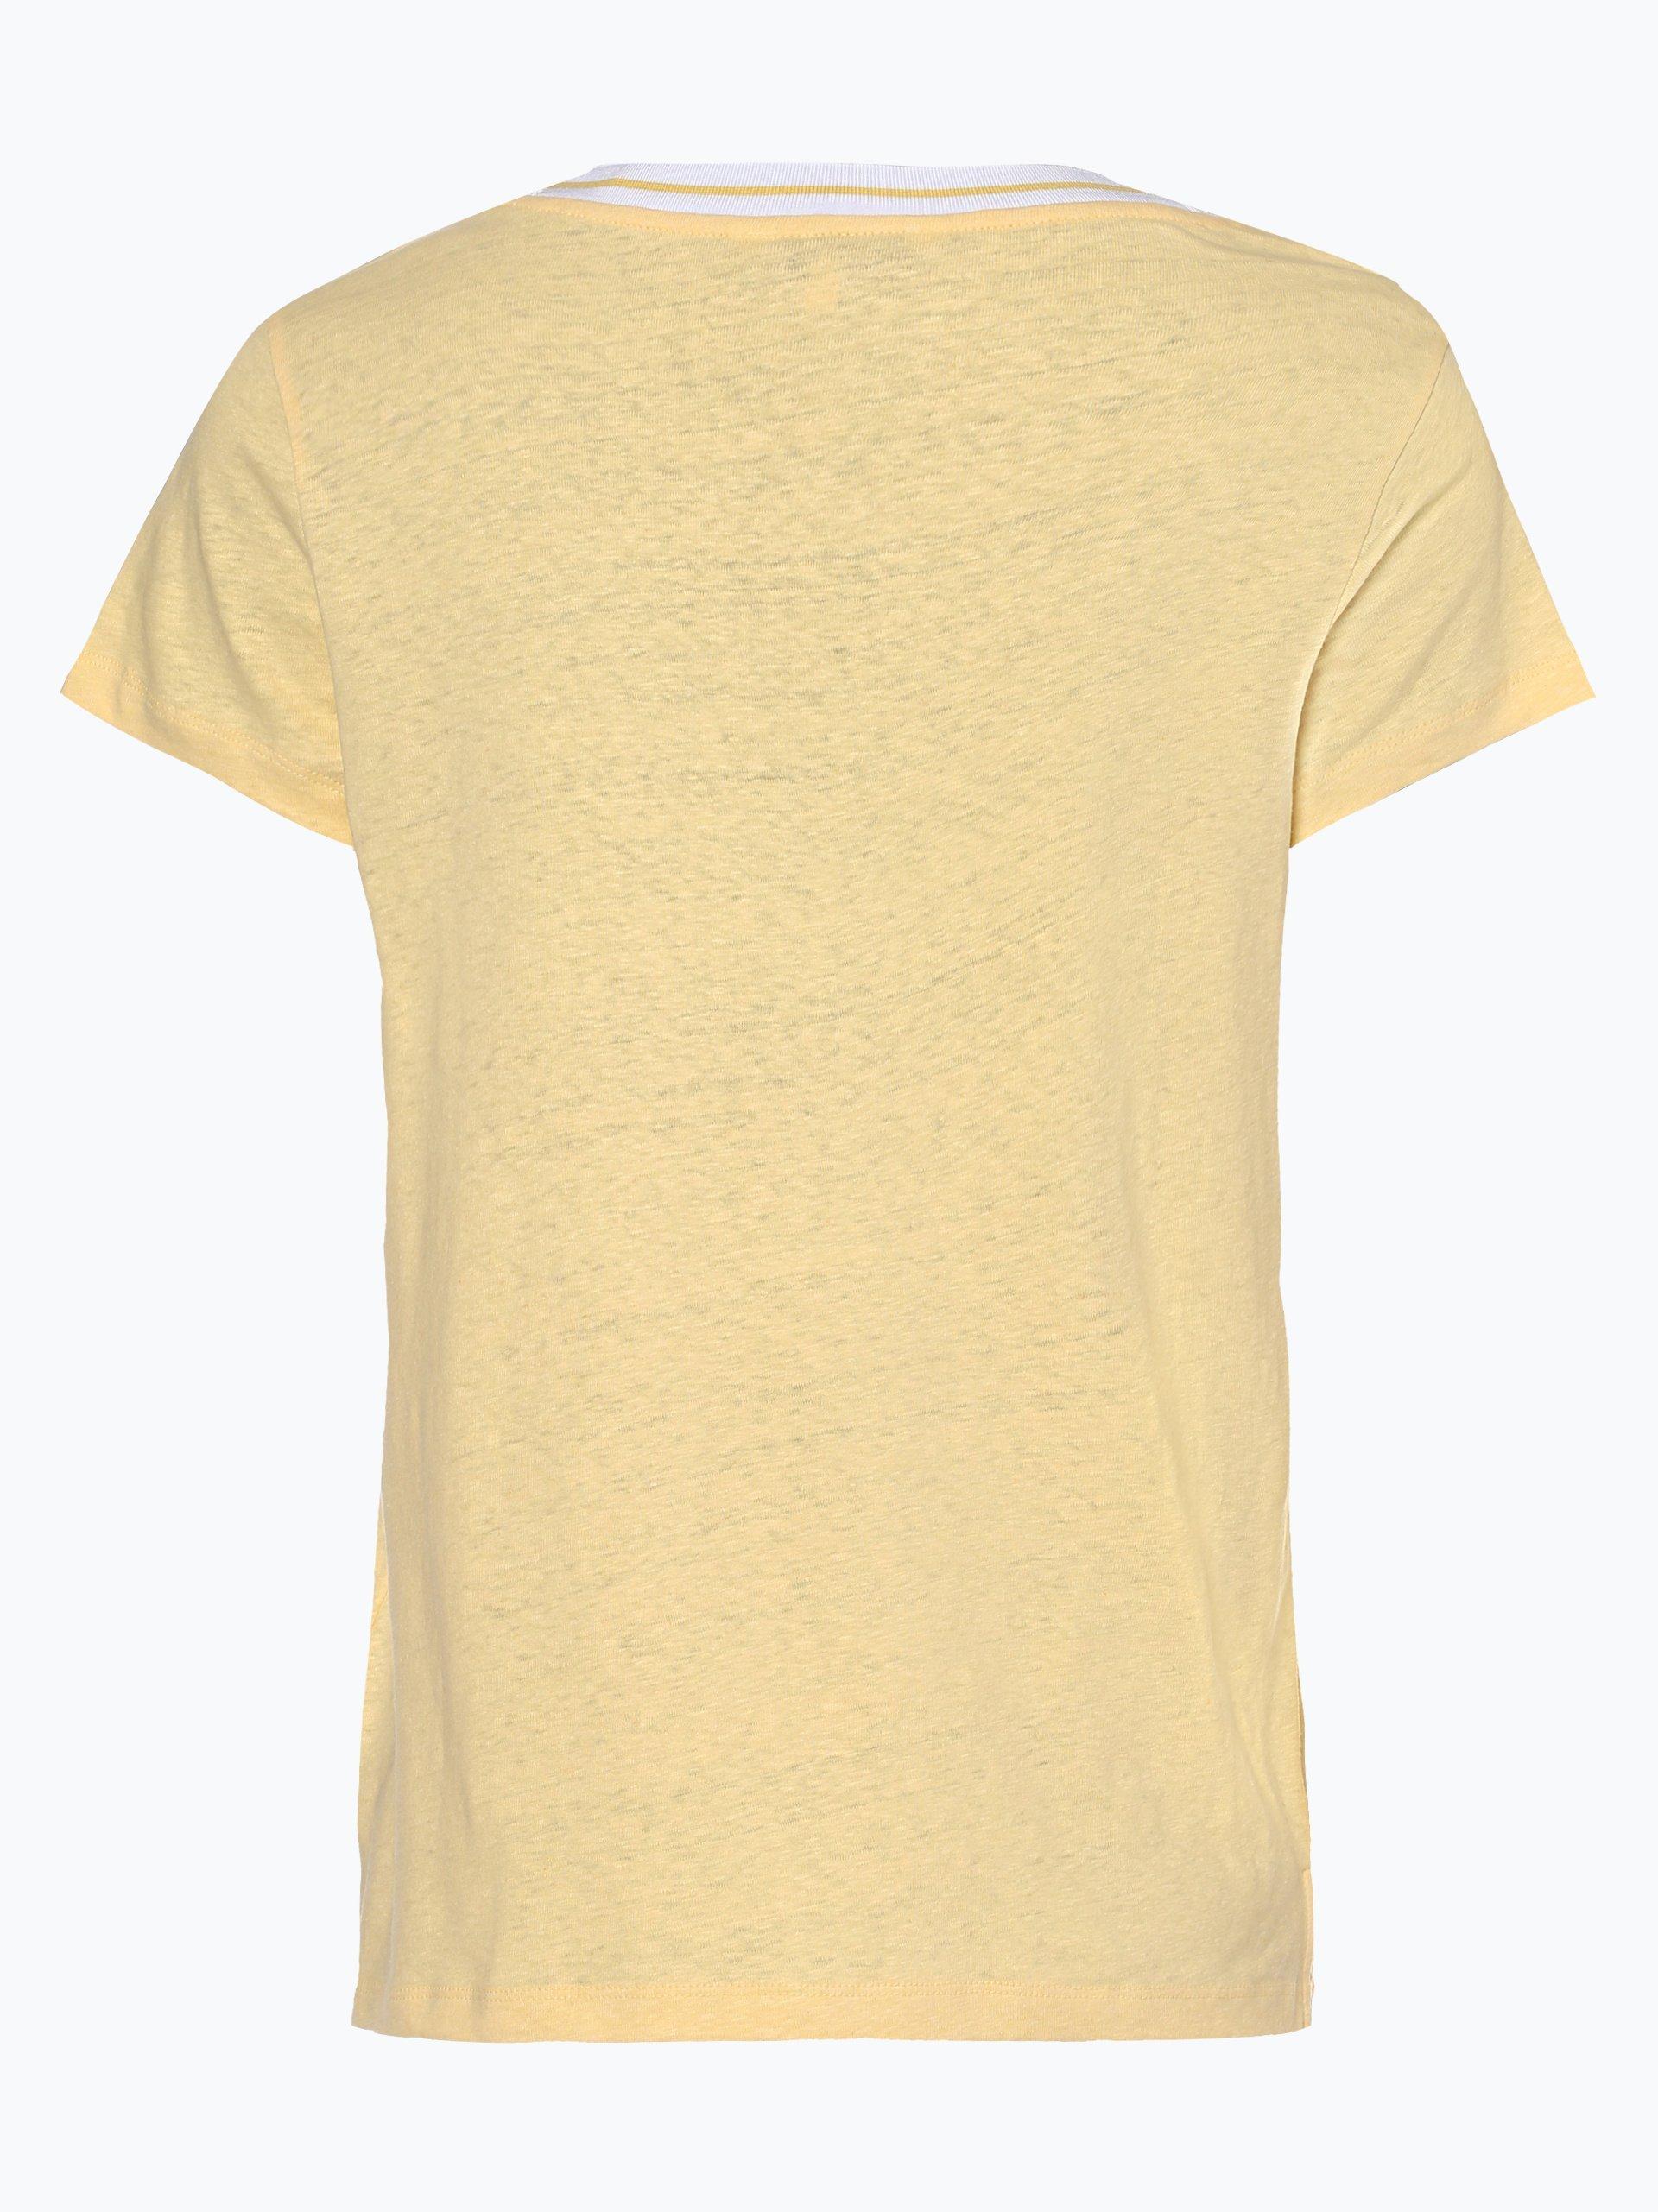 Tommy Hilfiger T-shirt damski z dodatkiem lnu – Ellen